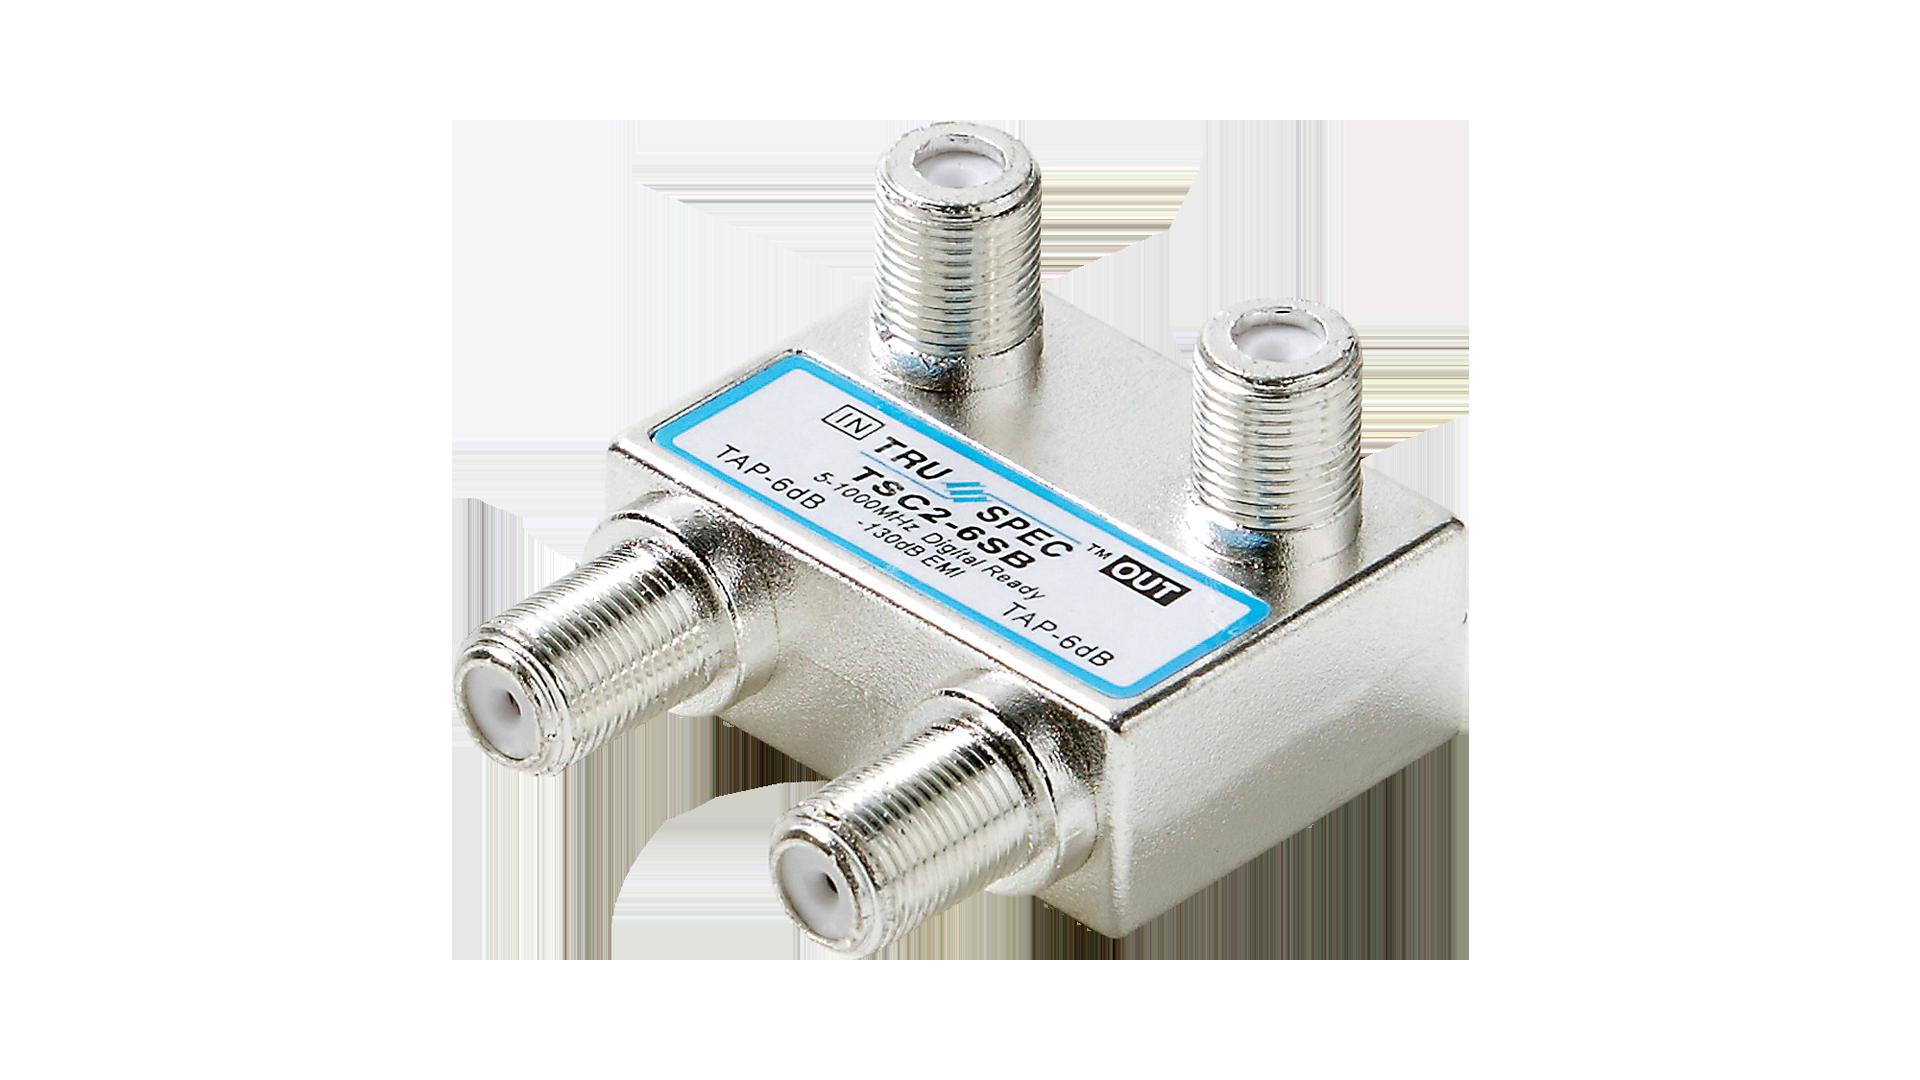 TSC2-SB: 2-Port Directional Coupler